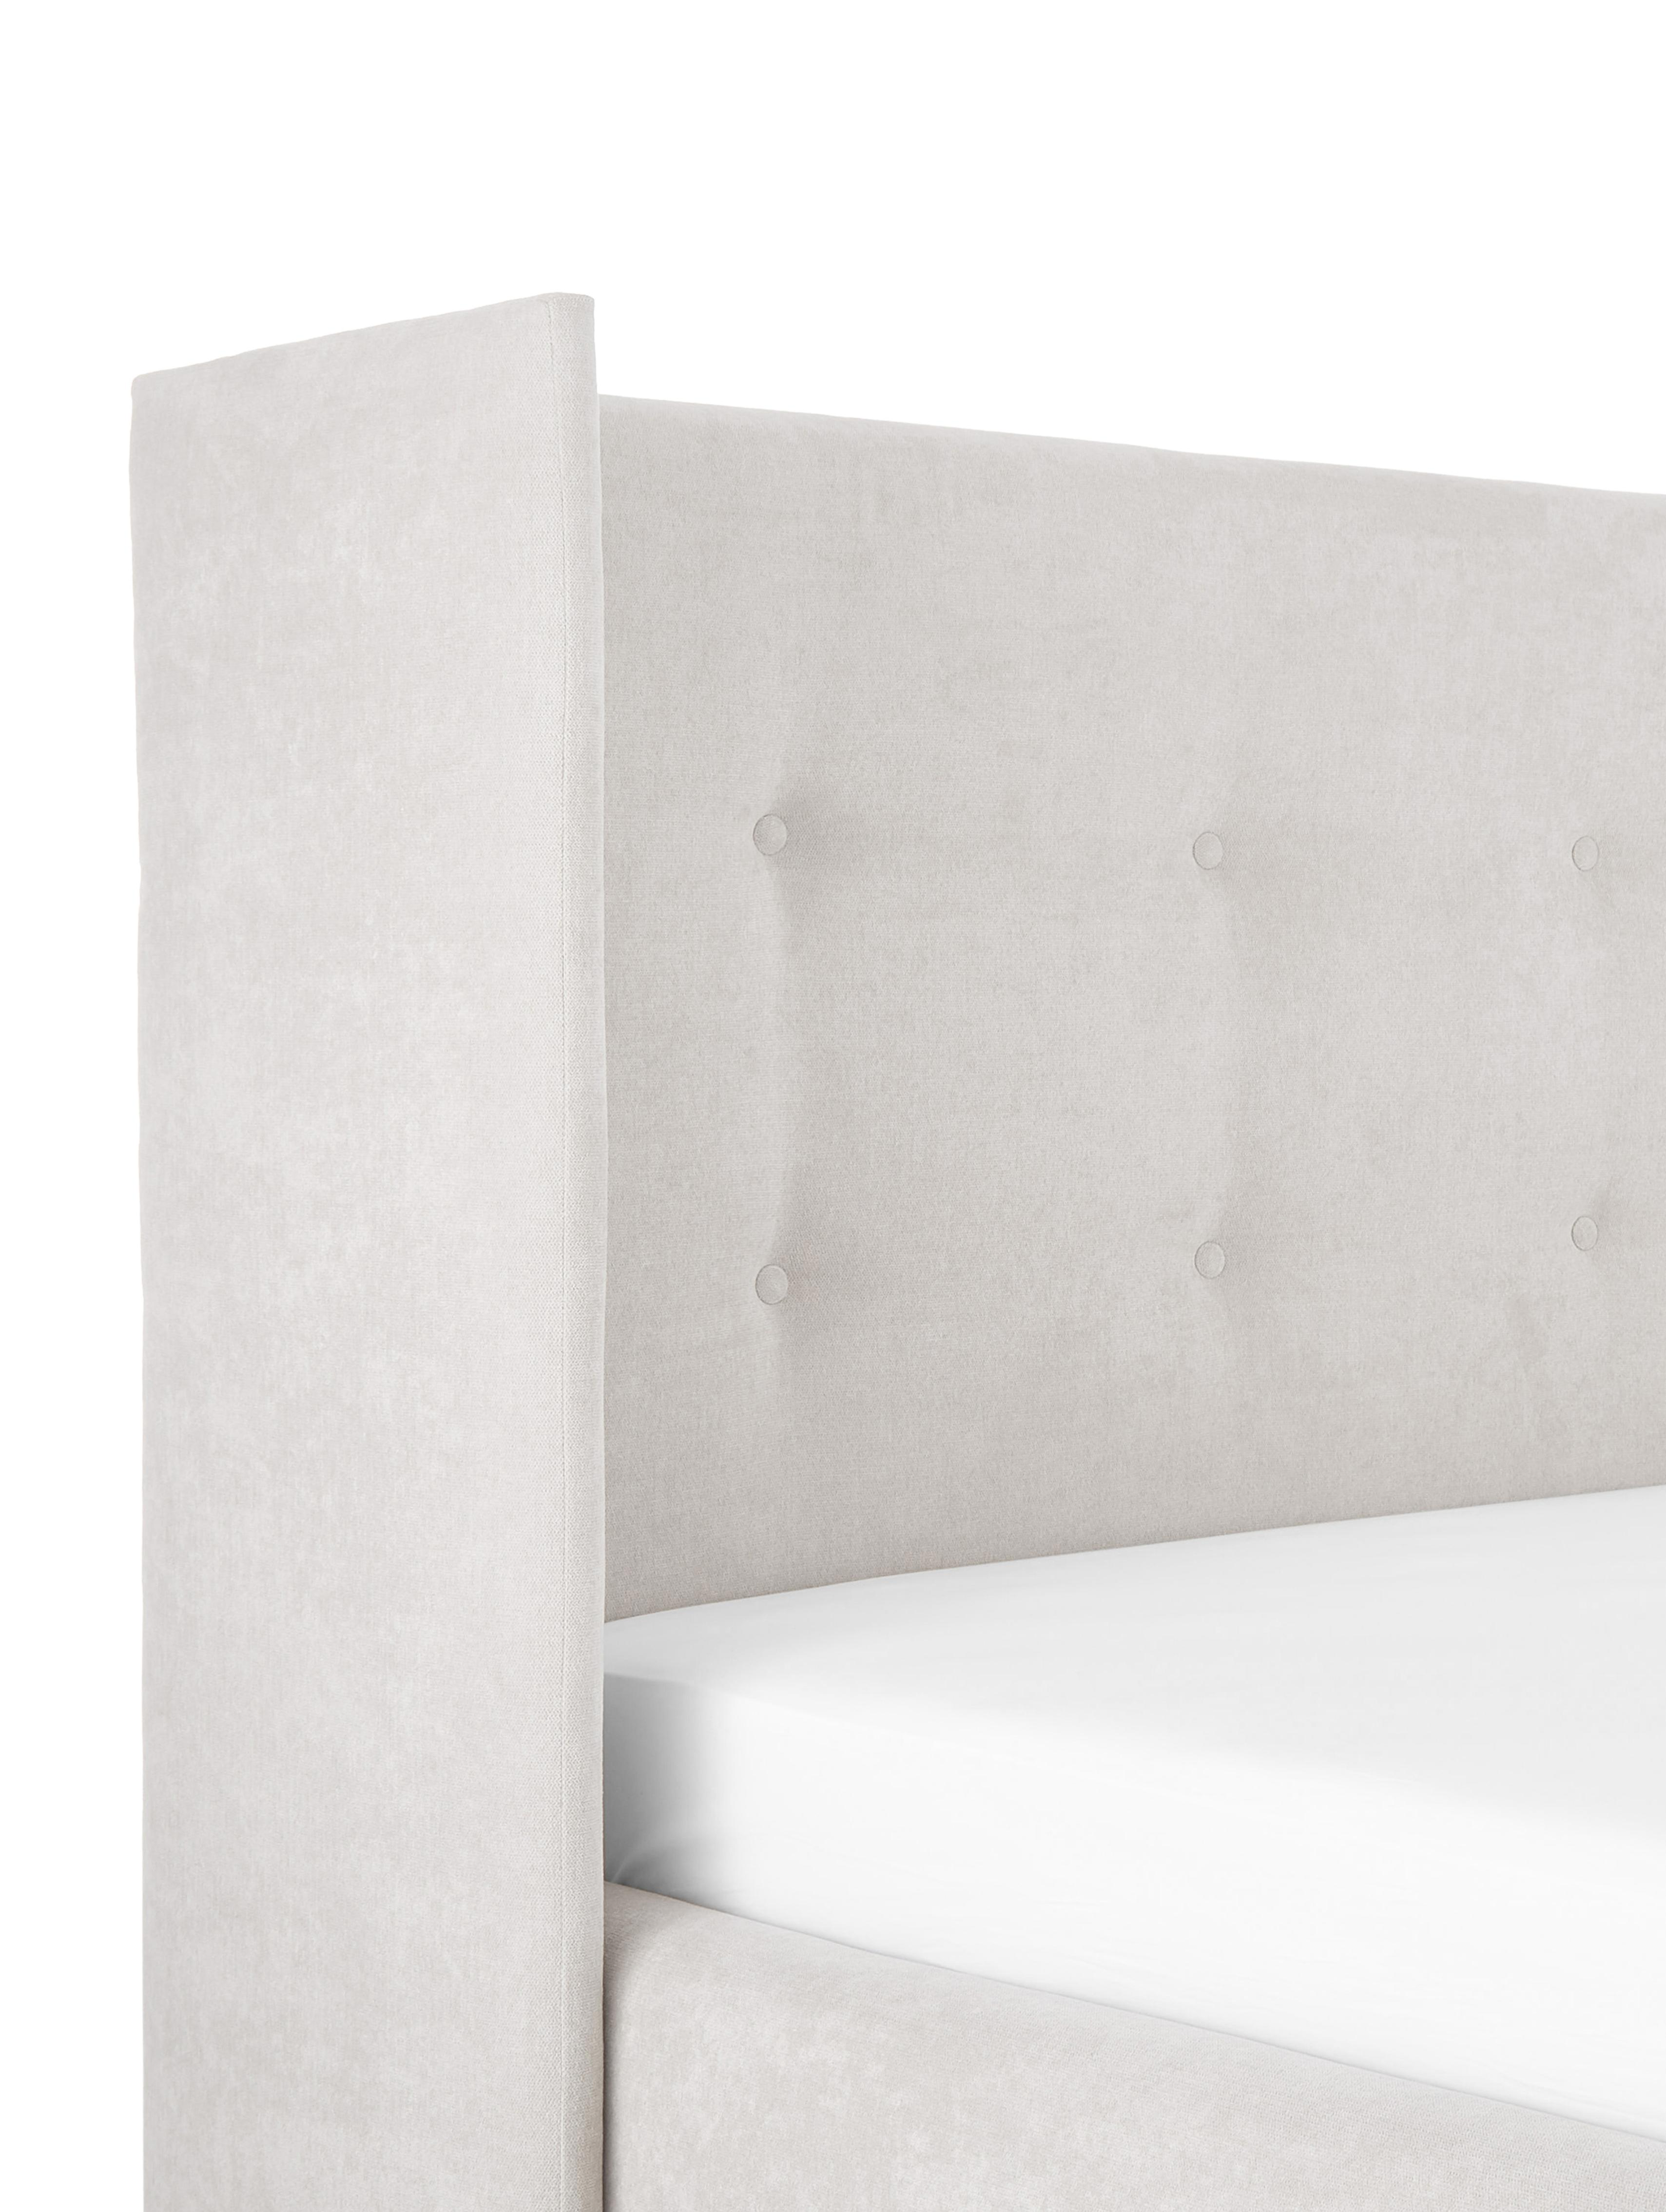 Polsterbett Star, Korpus: Massives Kiefernholz, Bezug: Polyester (Strukturstoff), Beige, 180 x 200 cm